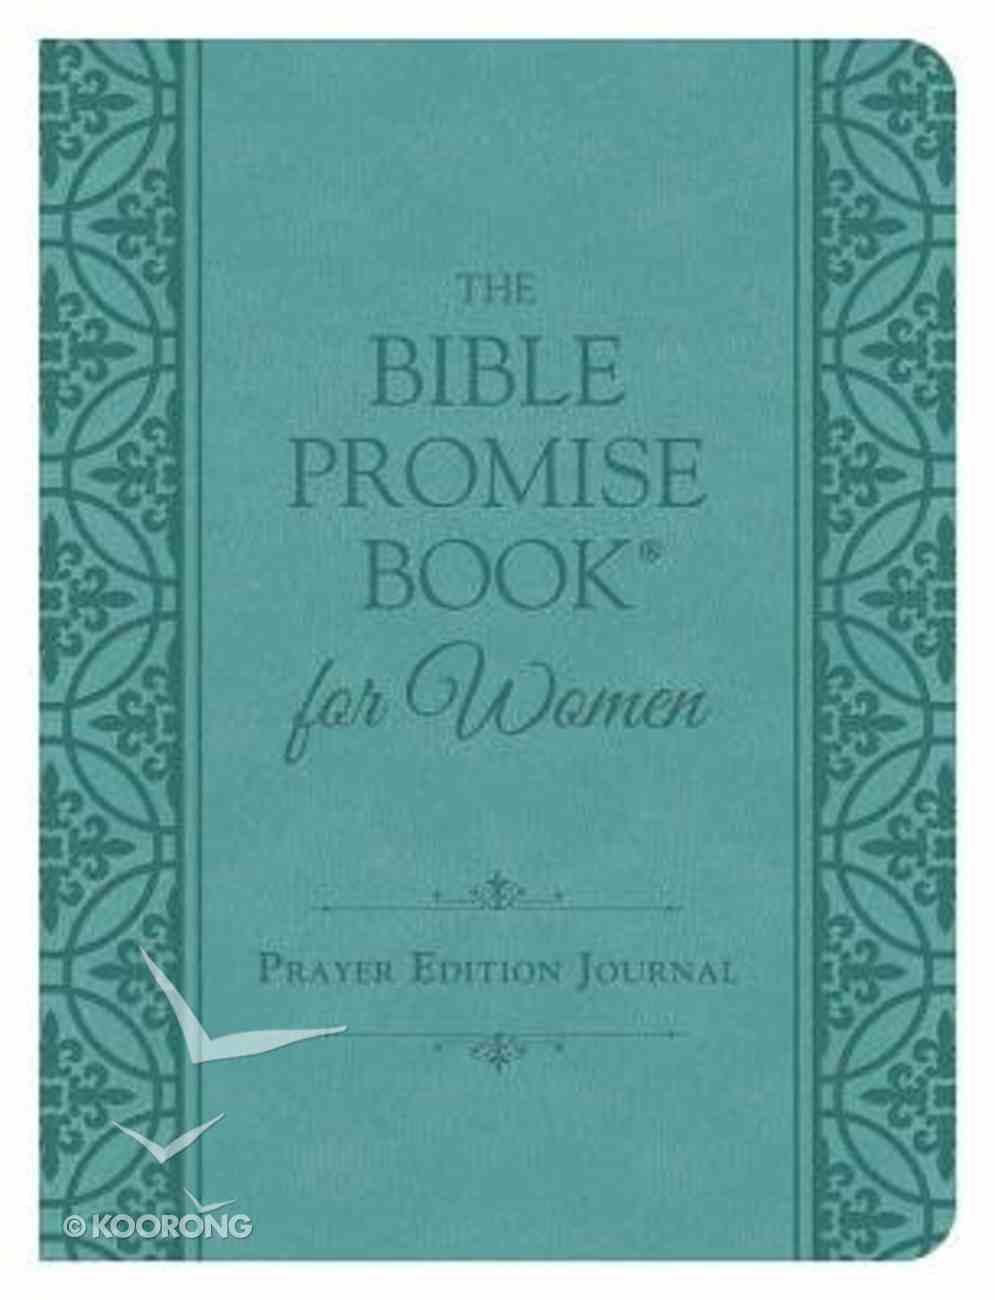 The Bible Promise Book For Women (Prayer Edition) Padded Hardback